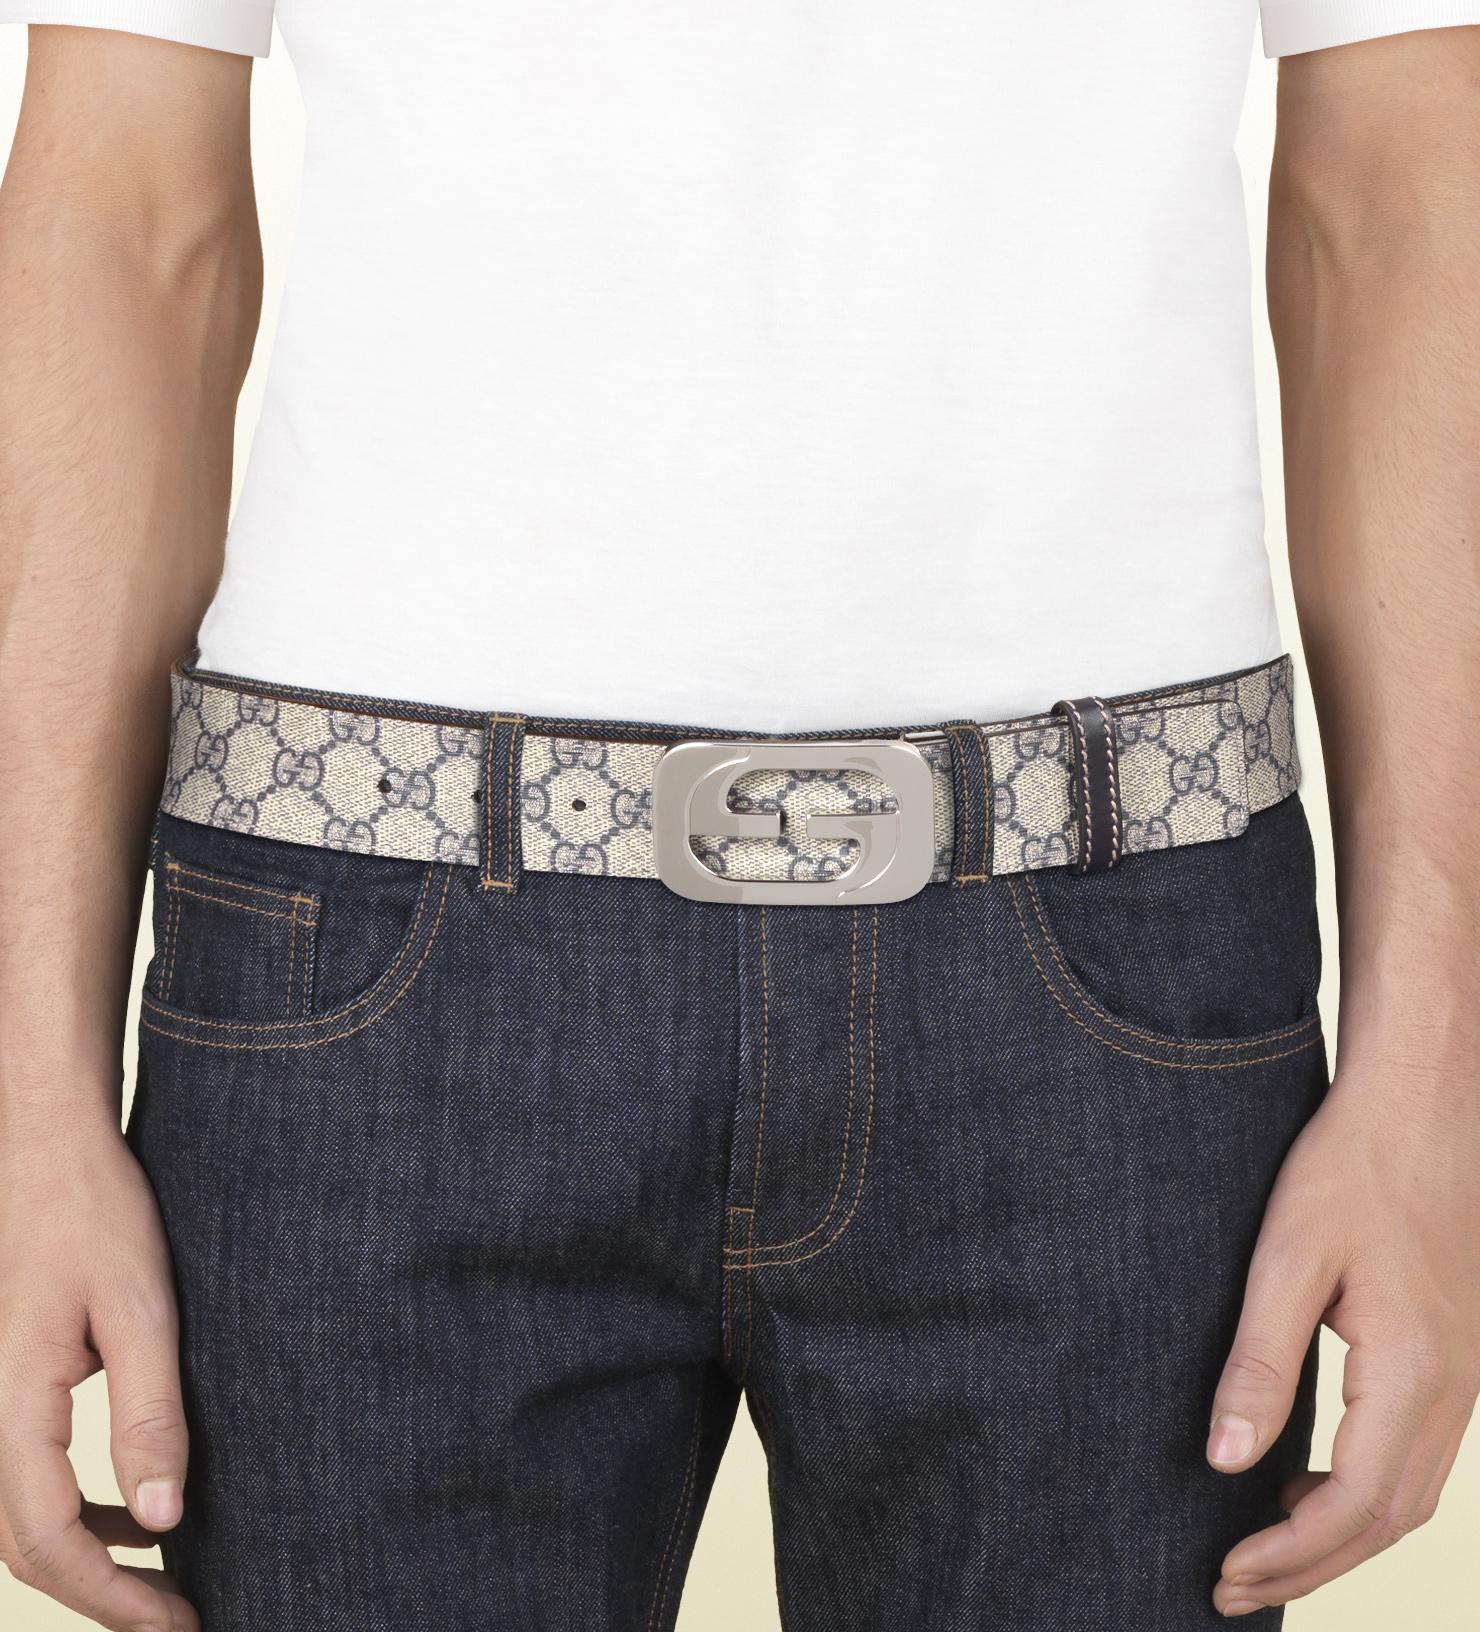 928bd5da93e2 Gucci Reversible Belt With Interlocking G Buckle in Natural for Men ...